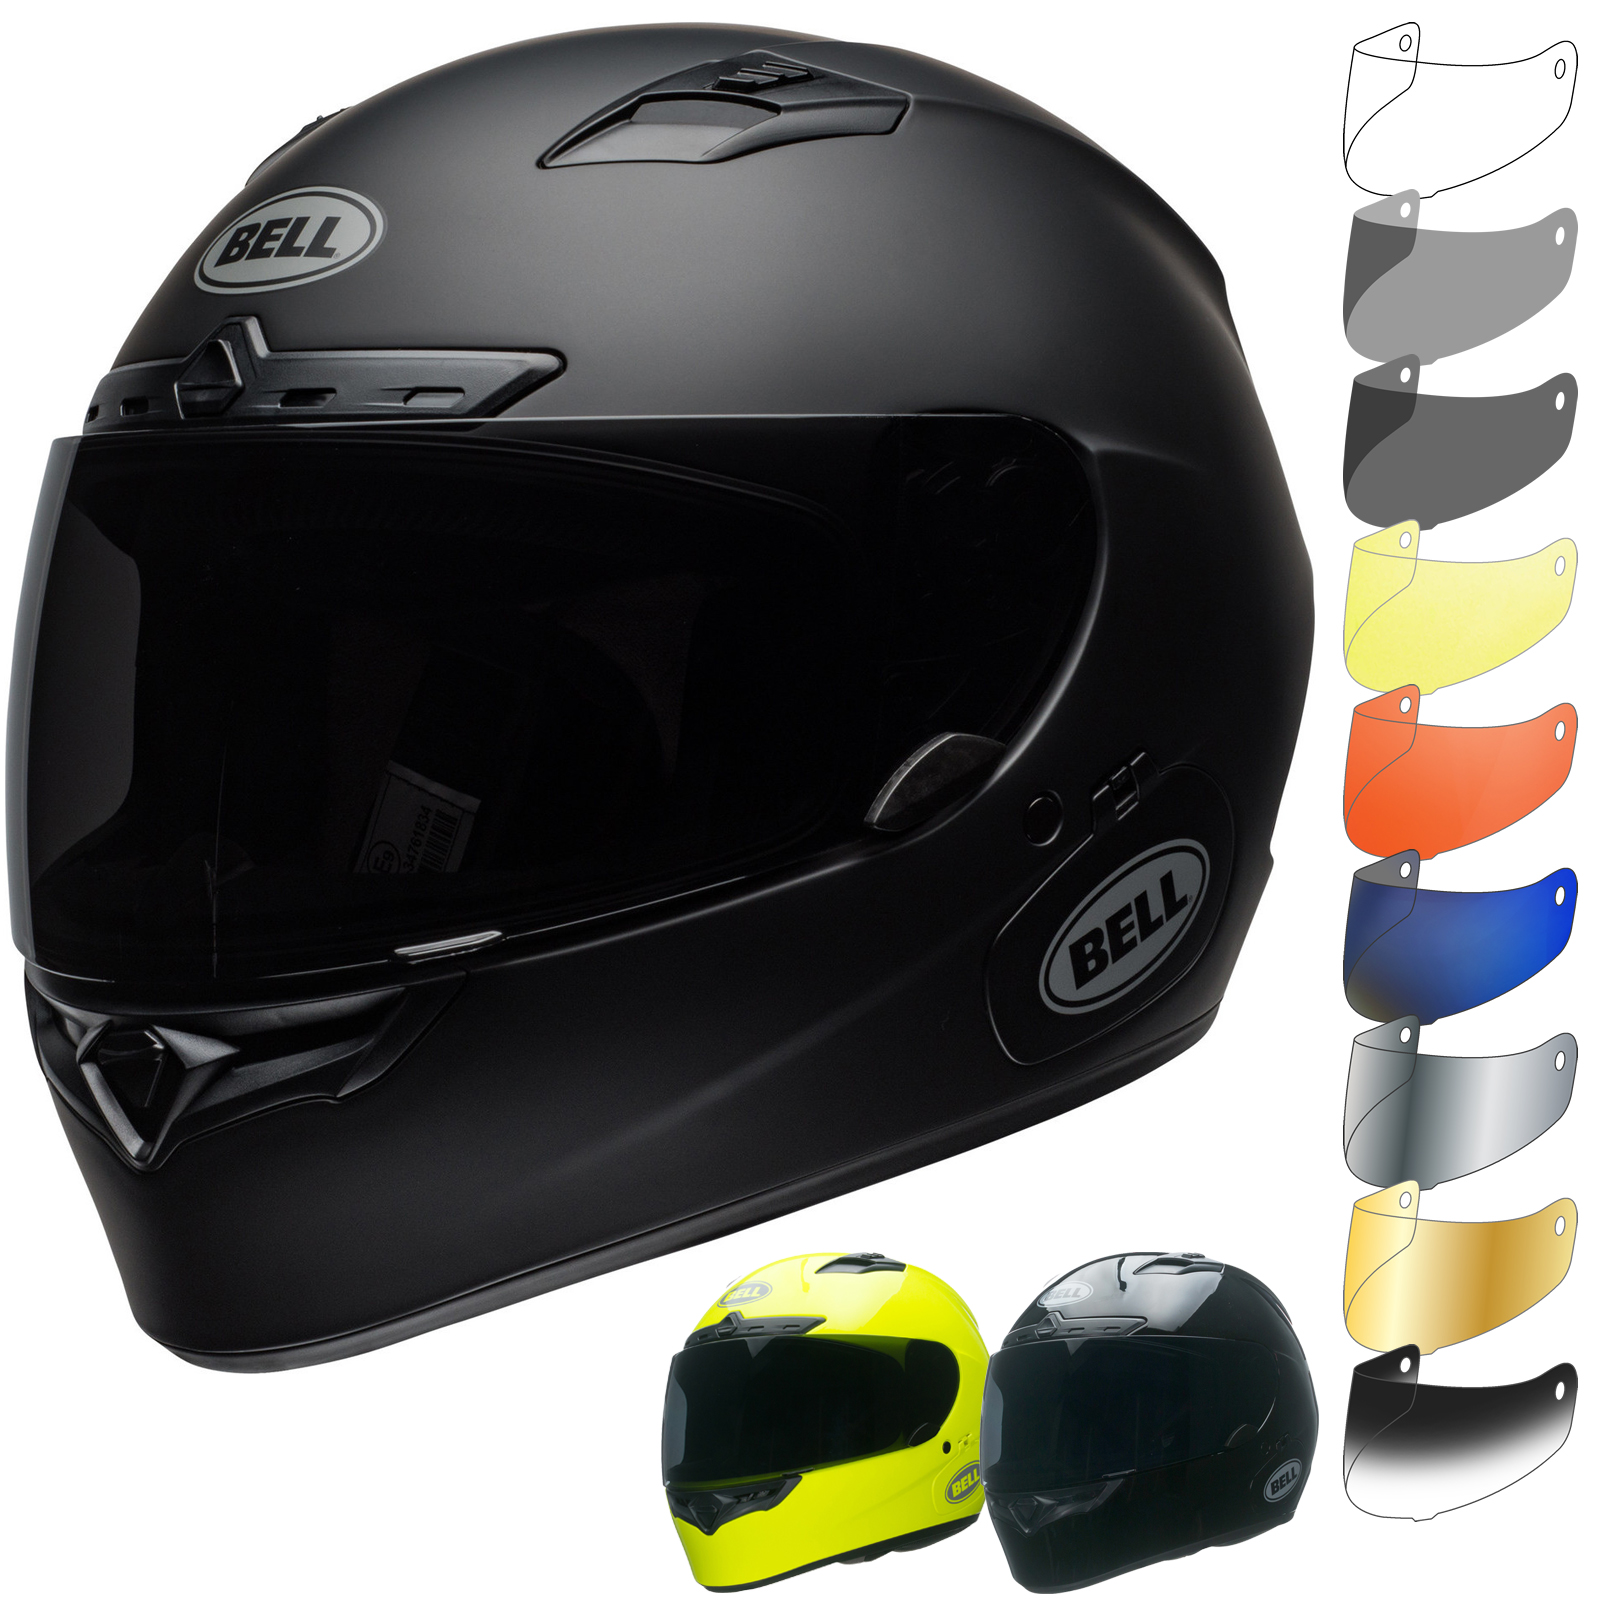 Bell Qualifier Dlx >> Bell Qualifier DLX MIPS Solid Motorcycle Helmet & Visor - Full Face Helmets - Ghostbikes.com